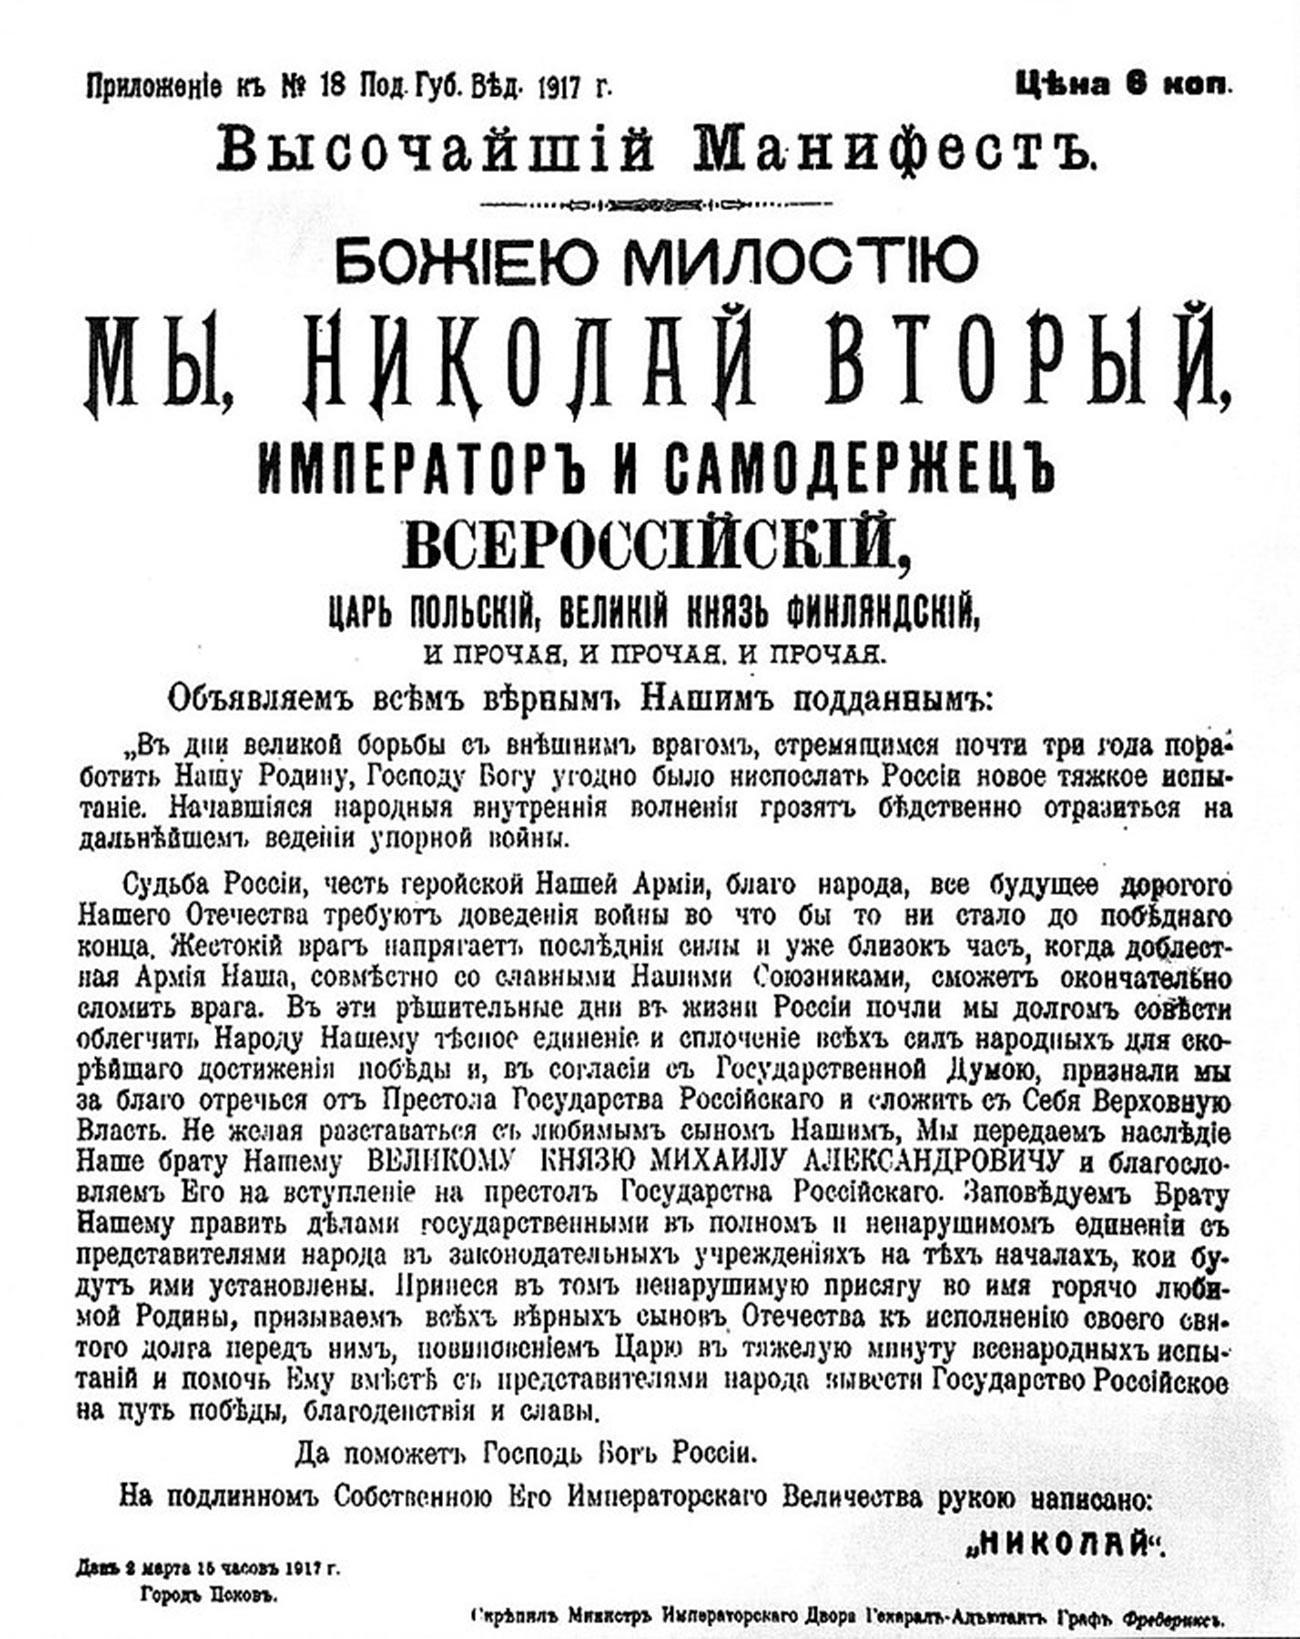 Manifesto pengunduran diri Nikolai II.